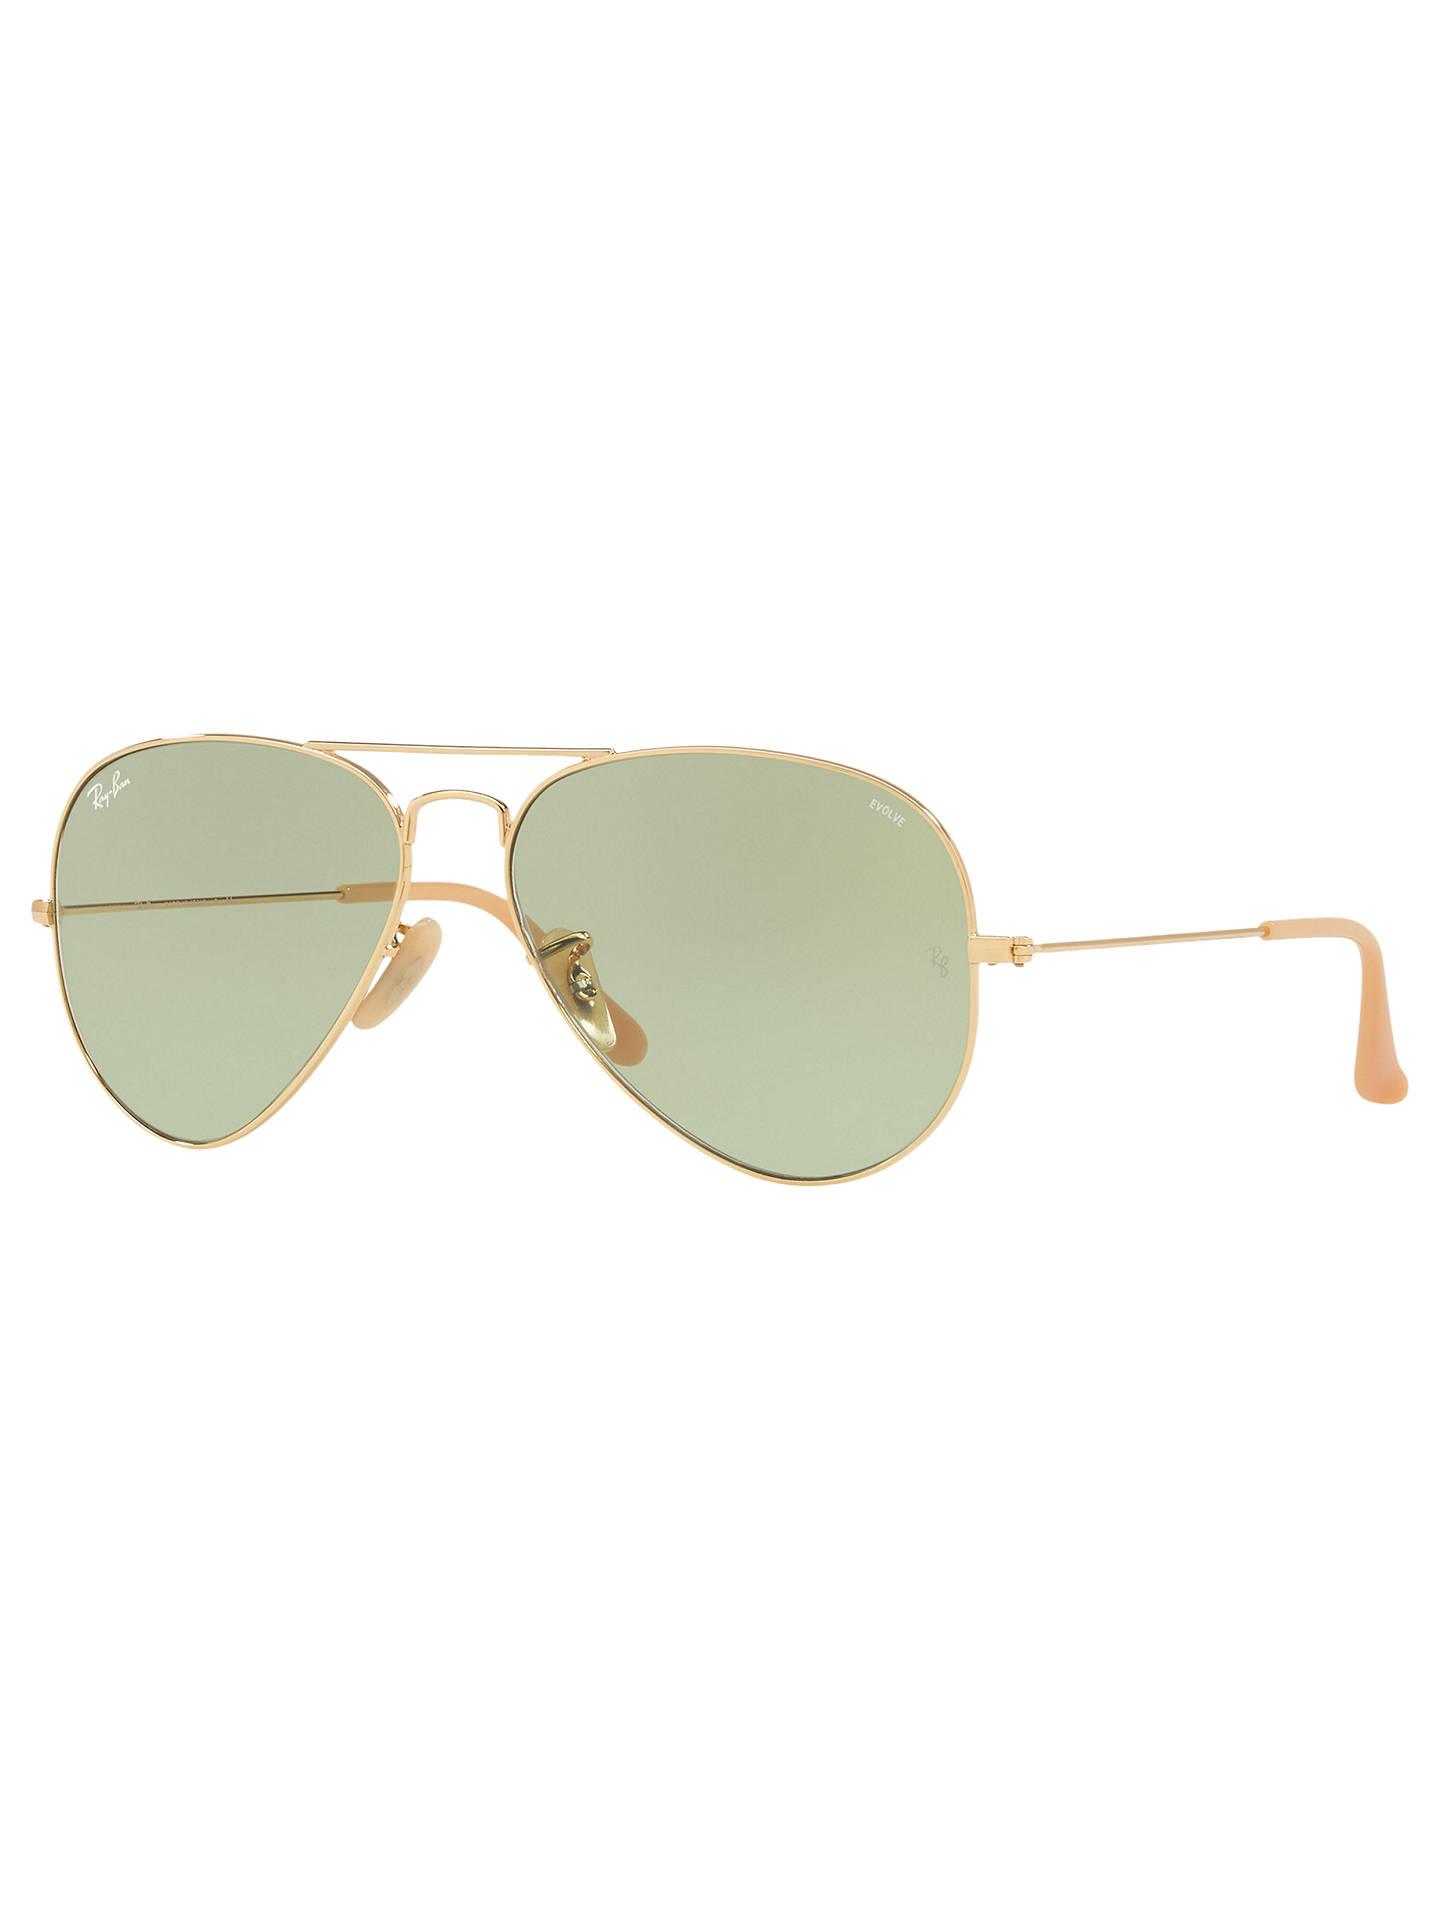 092596193 Buy Ray-Ban RB3025 Men's Evolve Original Aviator Sunglasses, Gold/Green  Online at ...